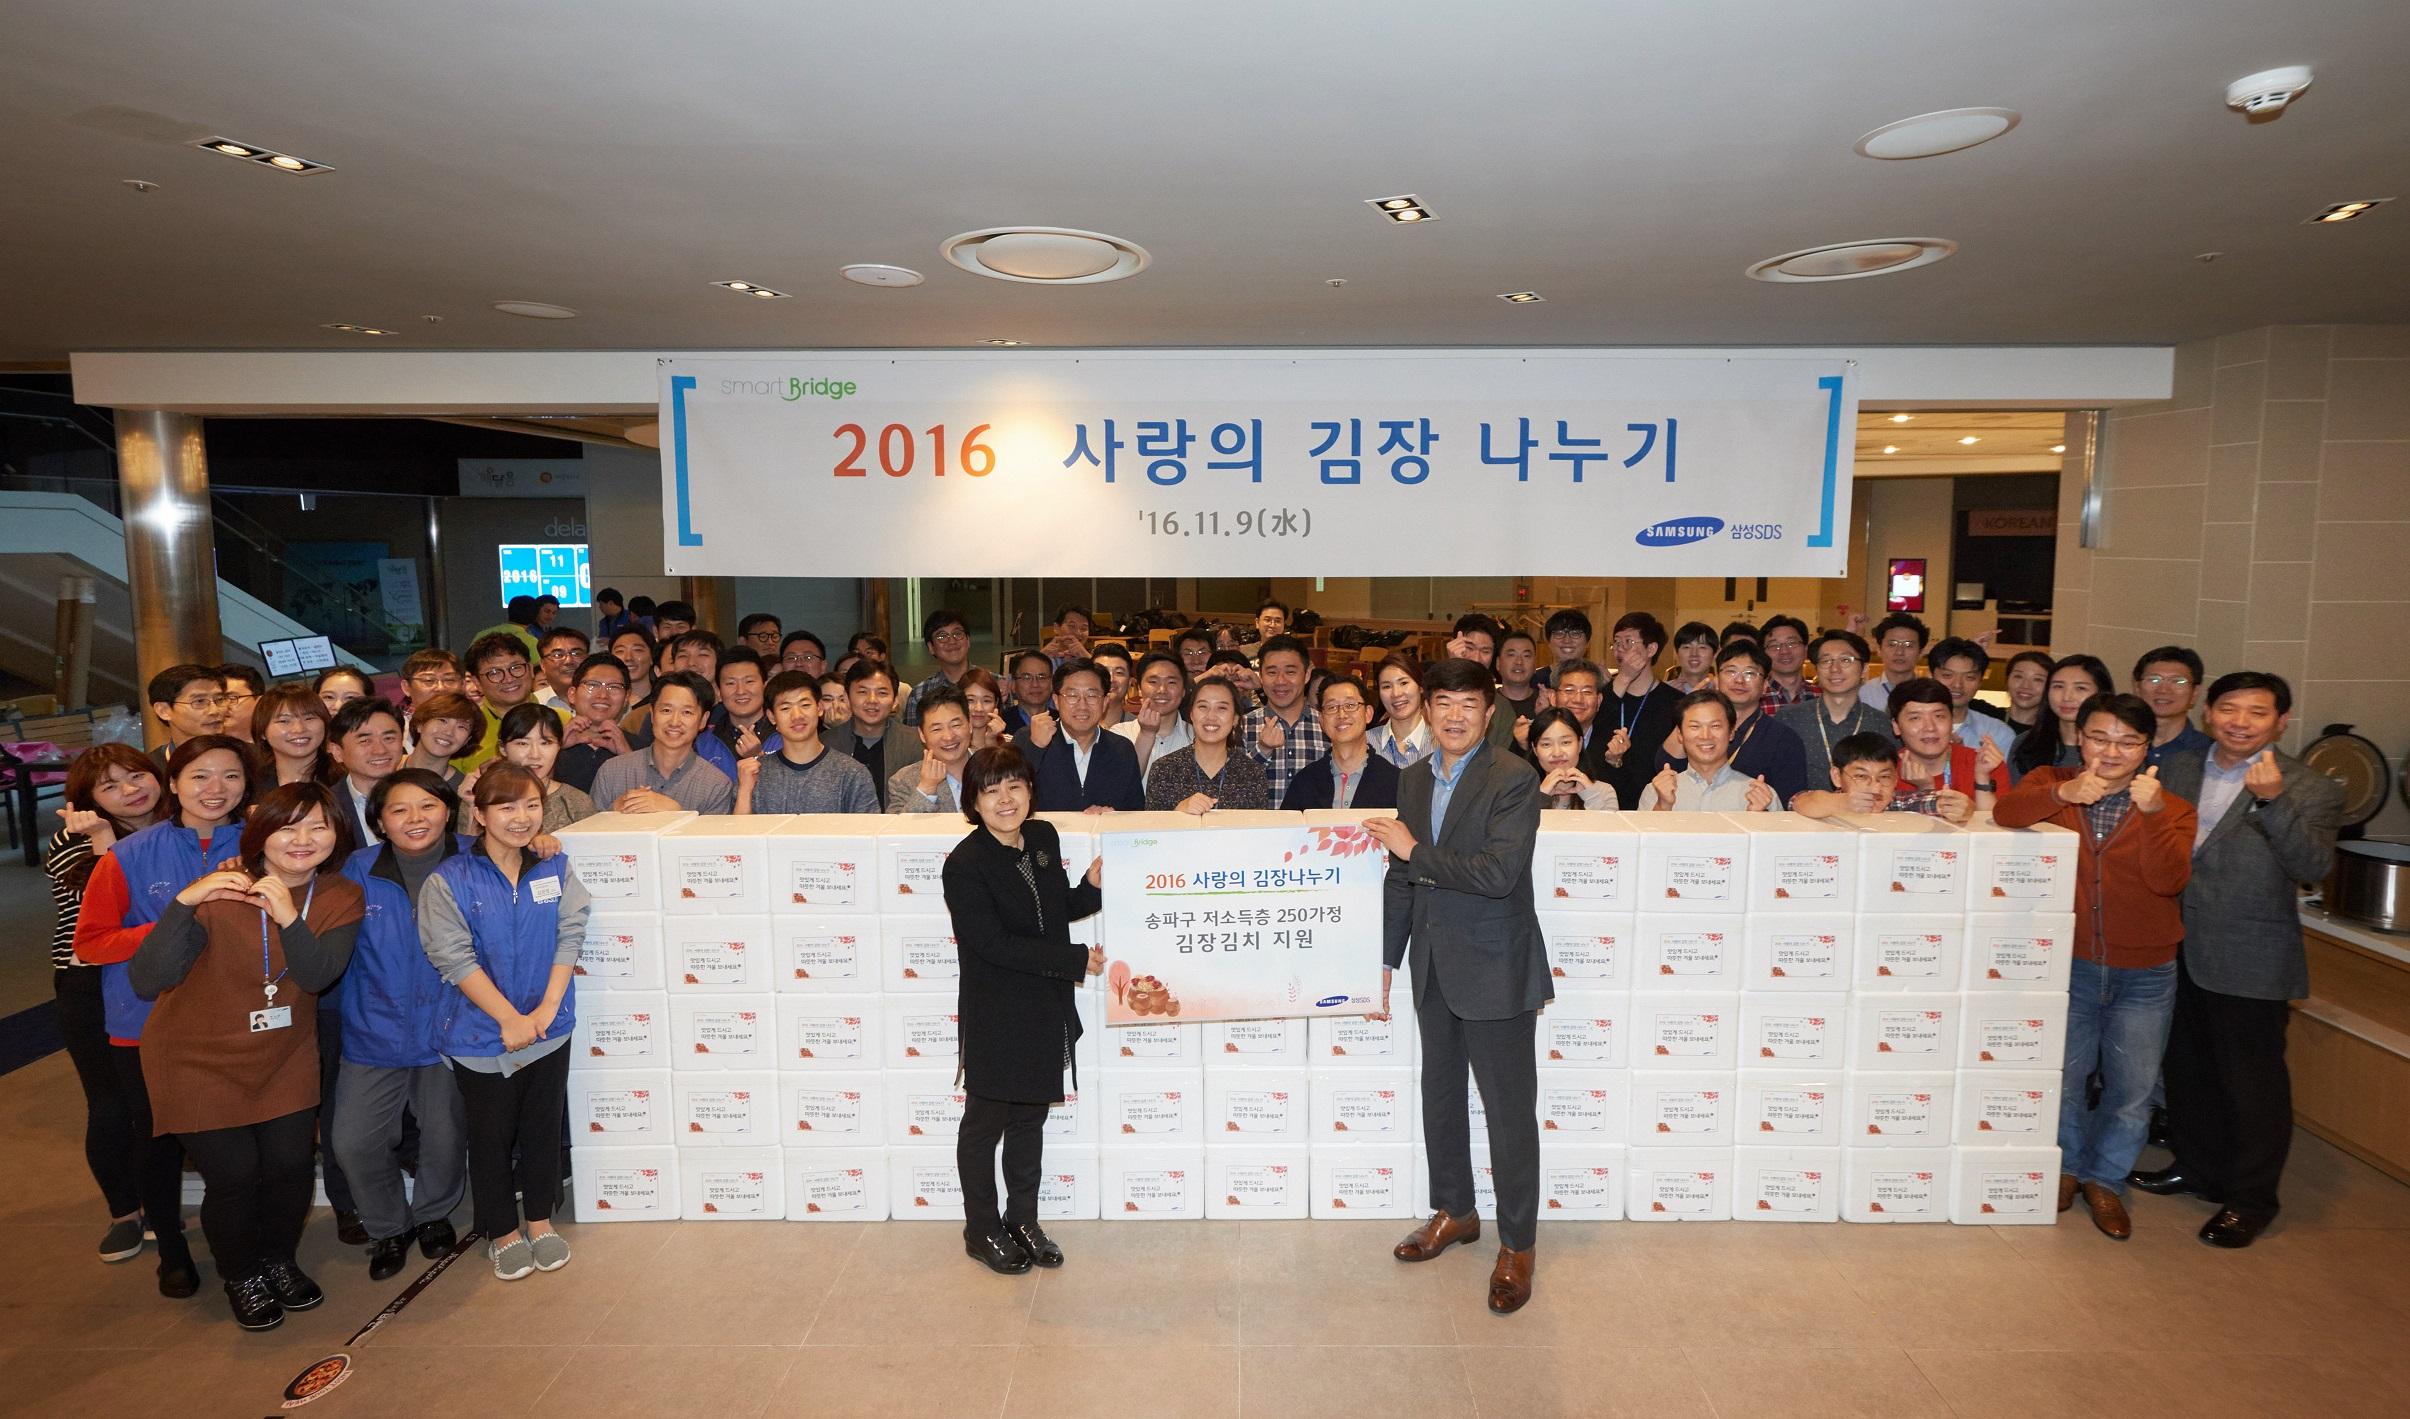 Kimchi delivery photo